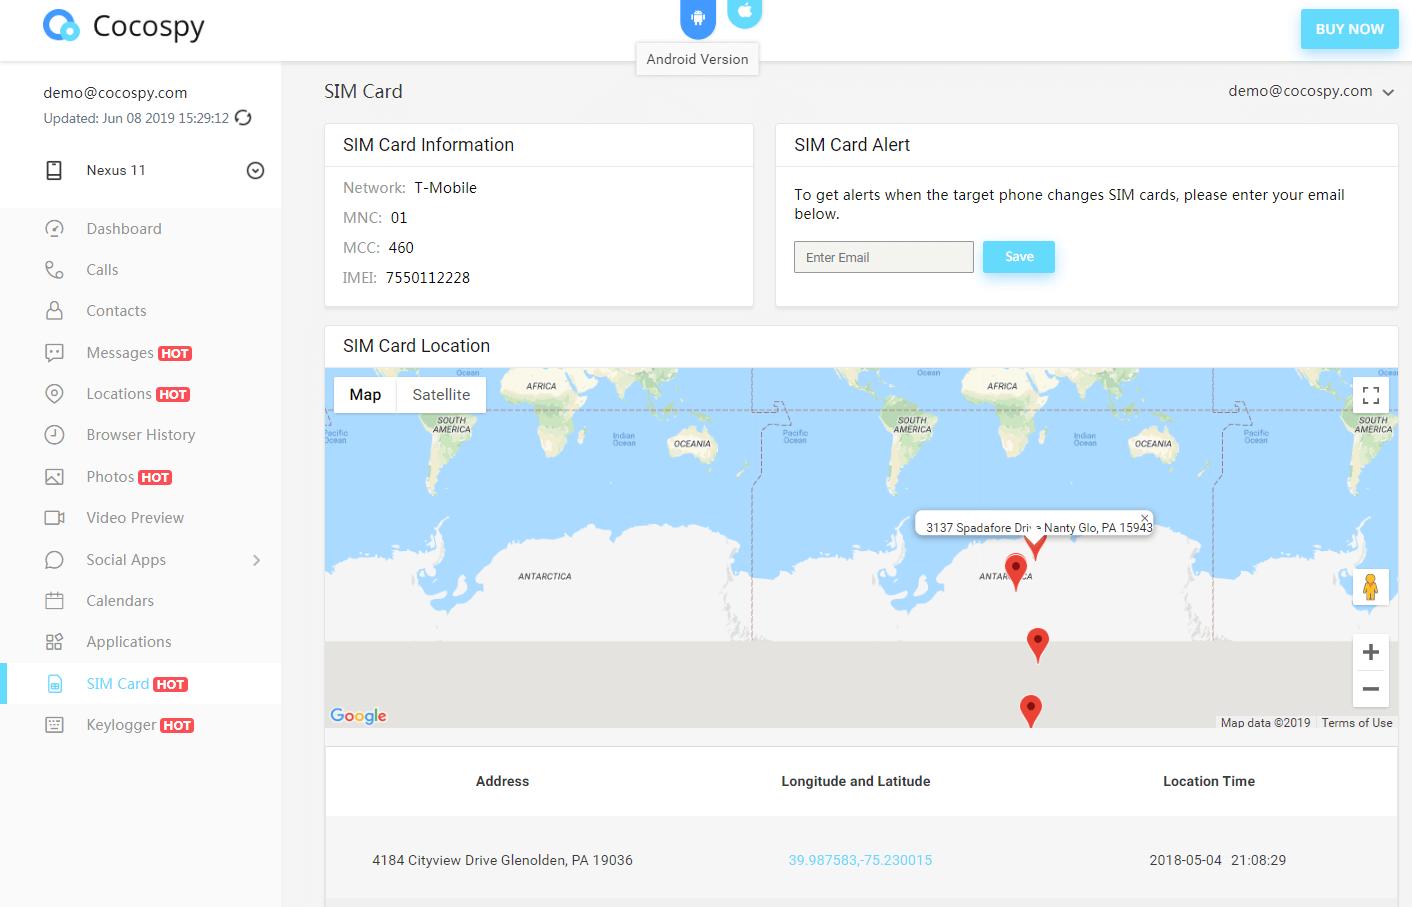 https://www.cocospy.com/assets/featire/sim-card-tracker-e2fe2a7847.png